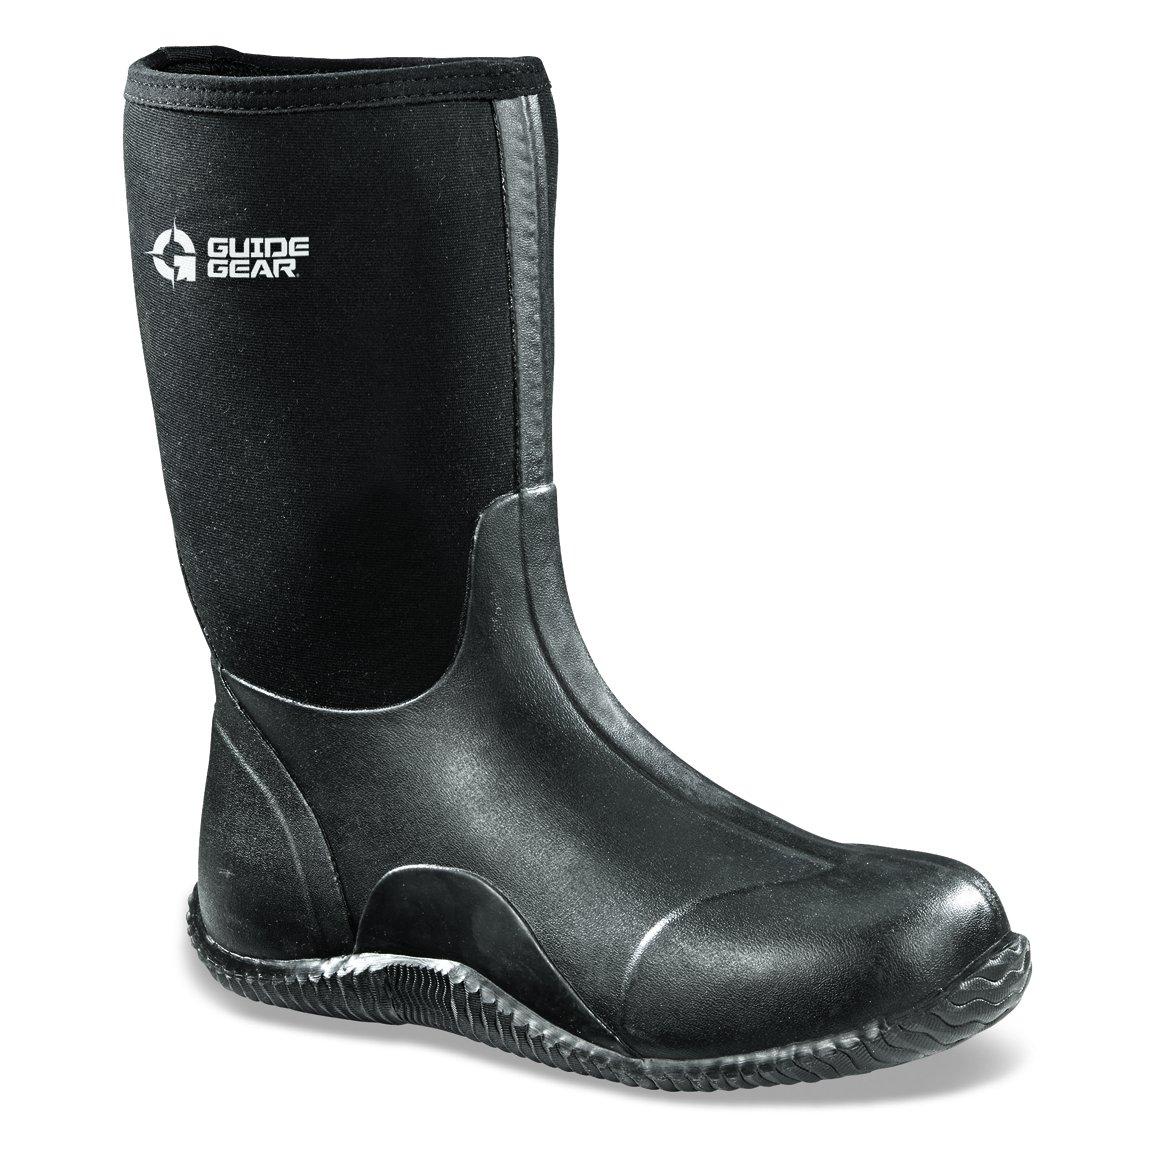 Guide Gear Men's Mid Bogger Waterproof Rubber Boots, Black by Guide Gear